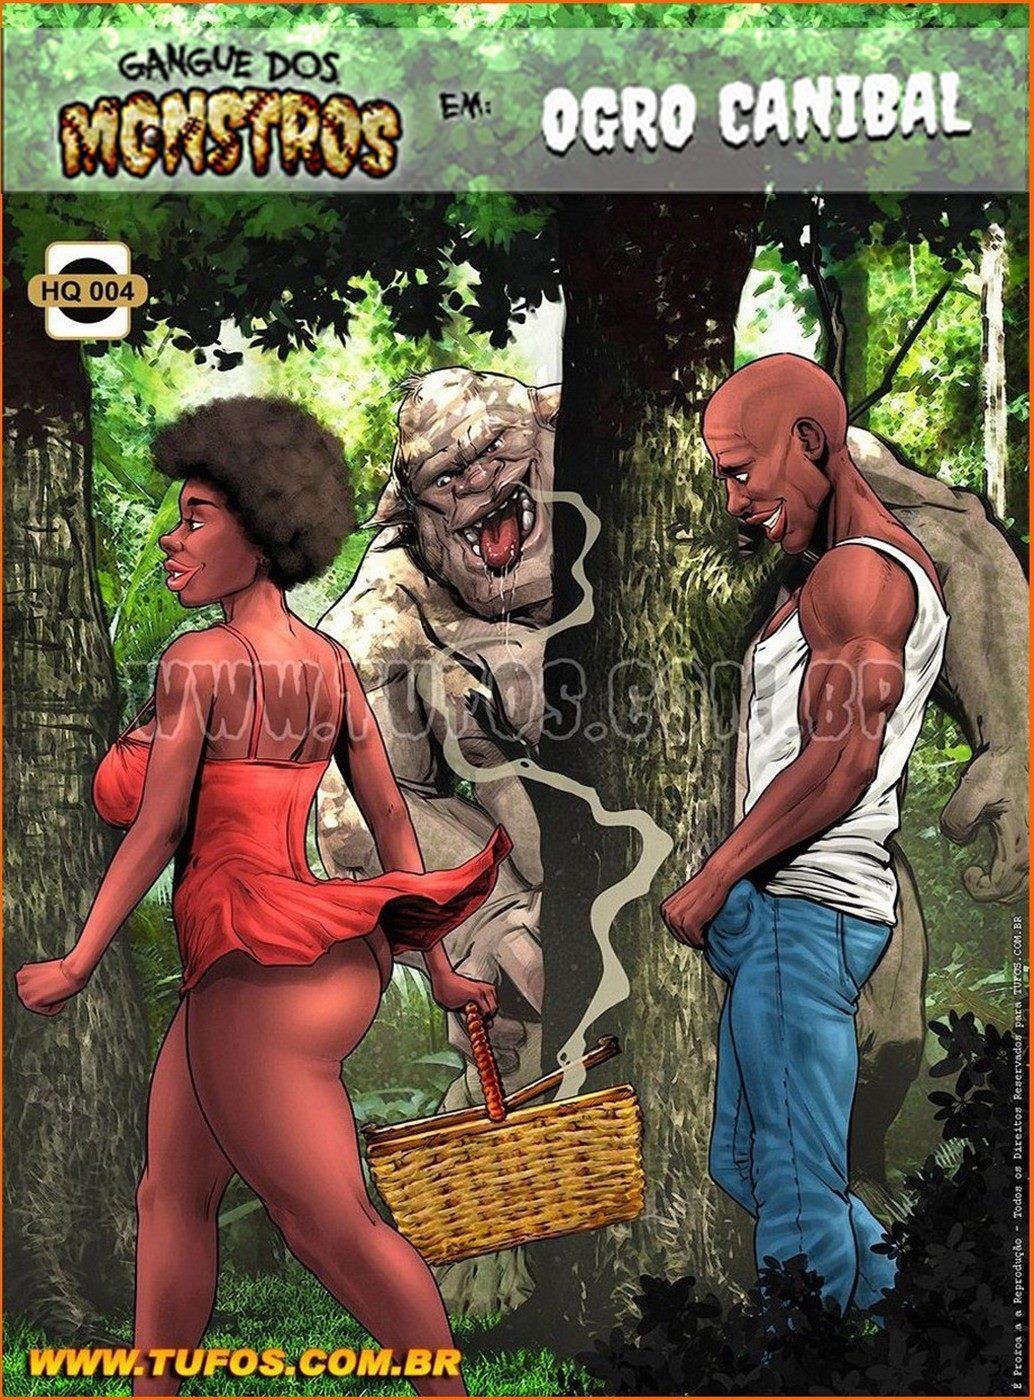 Porn Comics - Tufos – Gangue dos Monstros 4 porn comics 8 muses